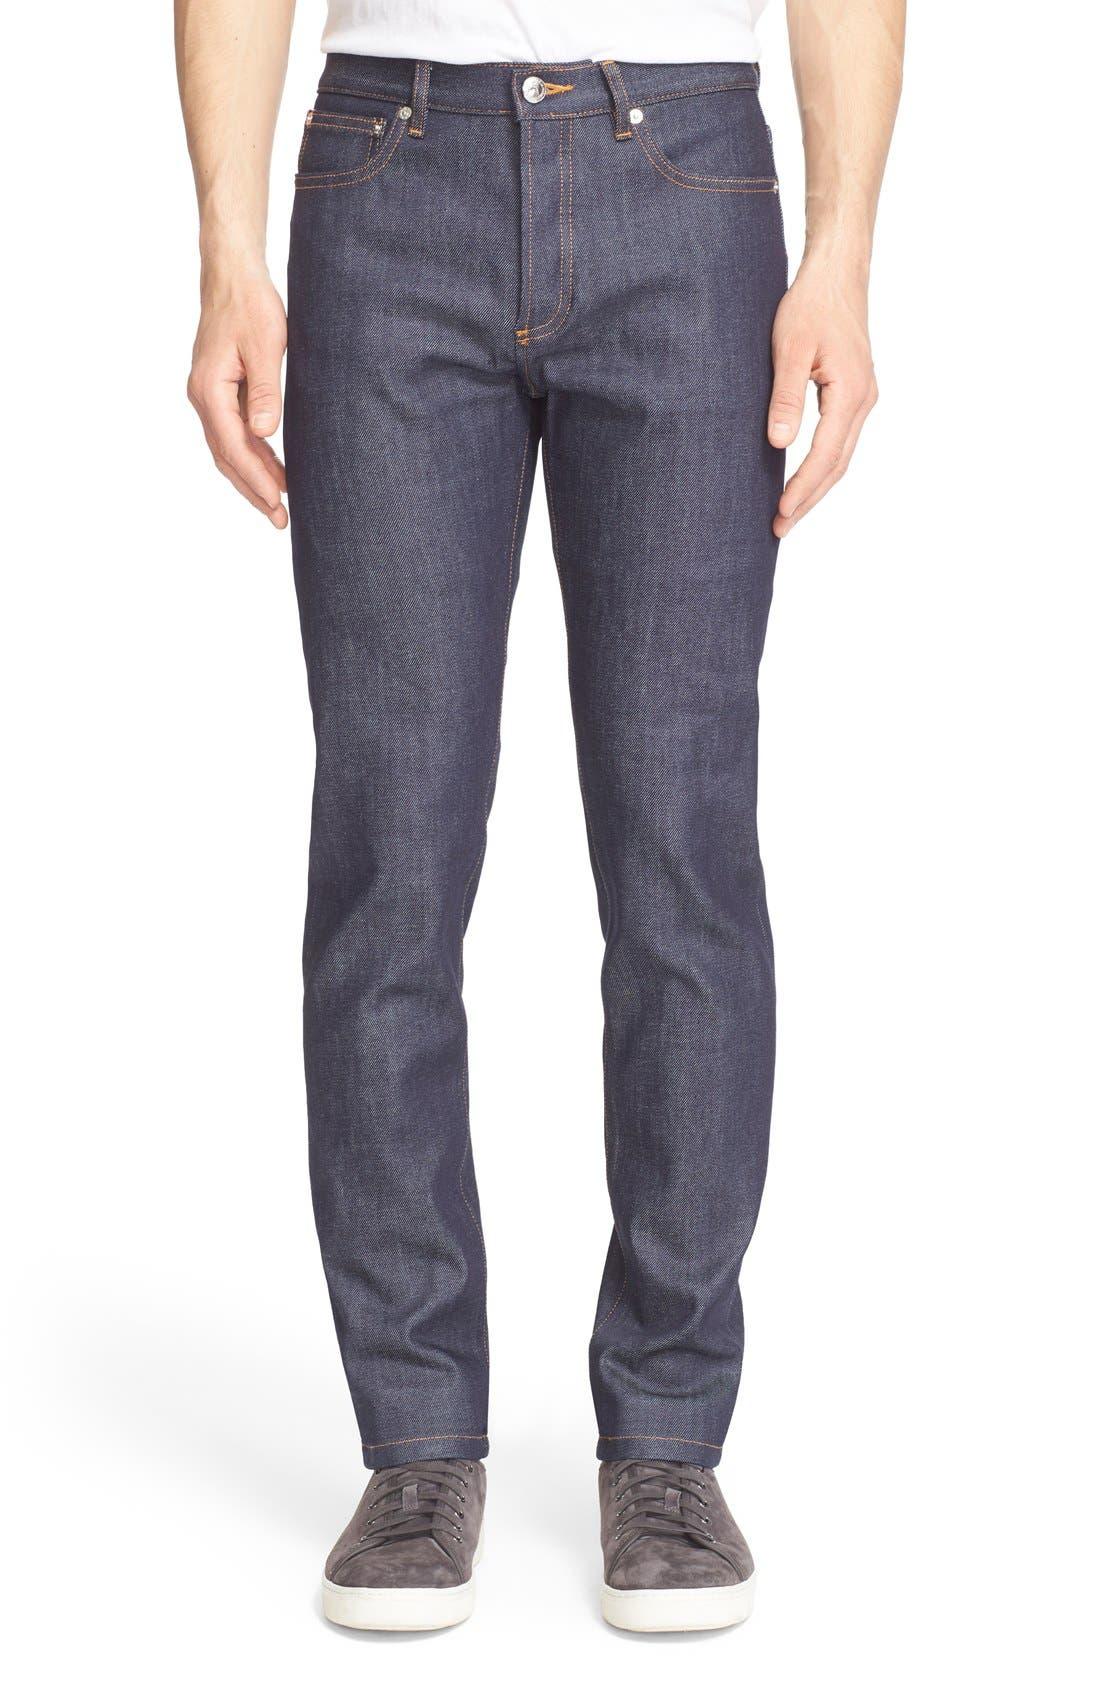 A.P.C. 'Petite New Standard' Skinny Fit Jeans (Indigo)